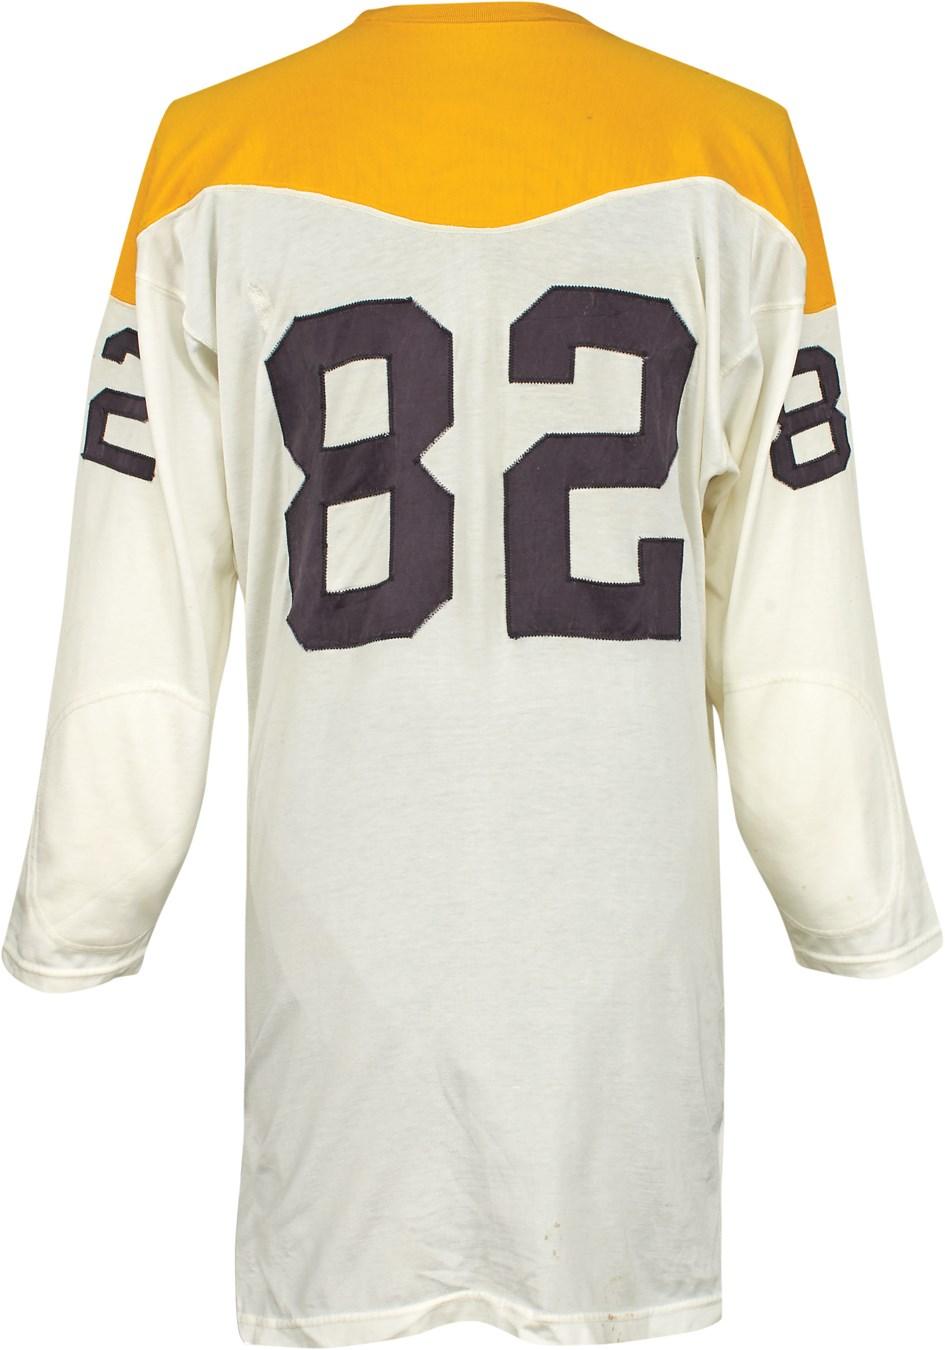 2744dc4acb4 1966-67 John Hilton Pittsburgh Steelers Game Worn Jersey